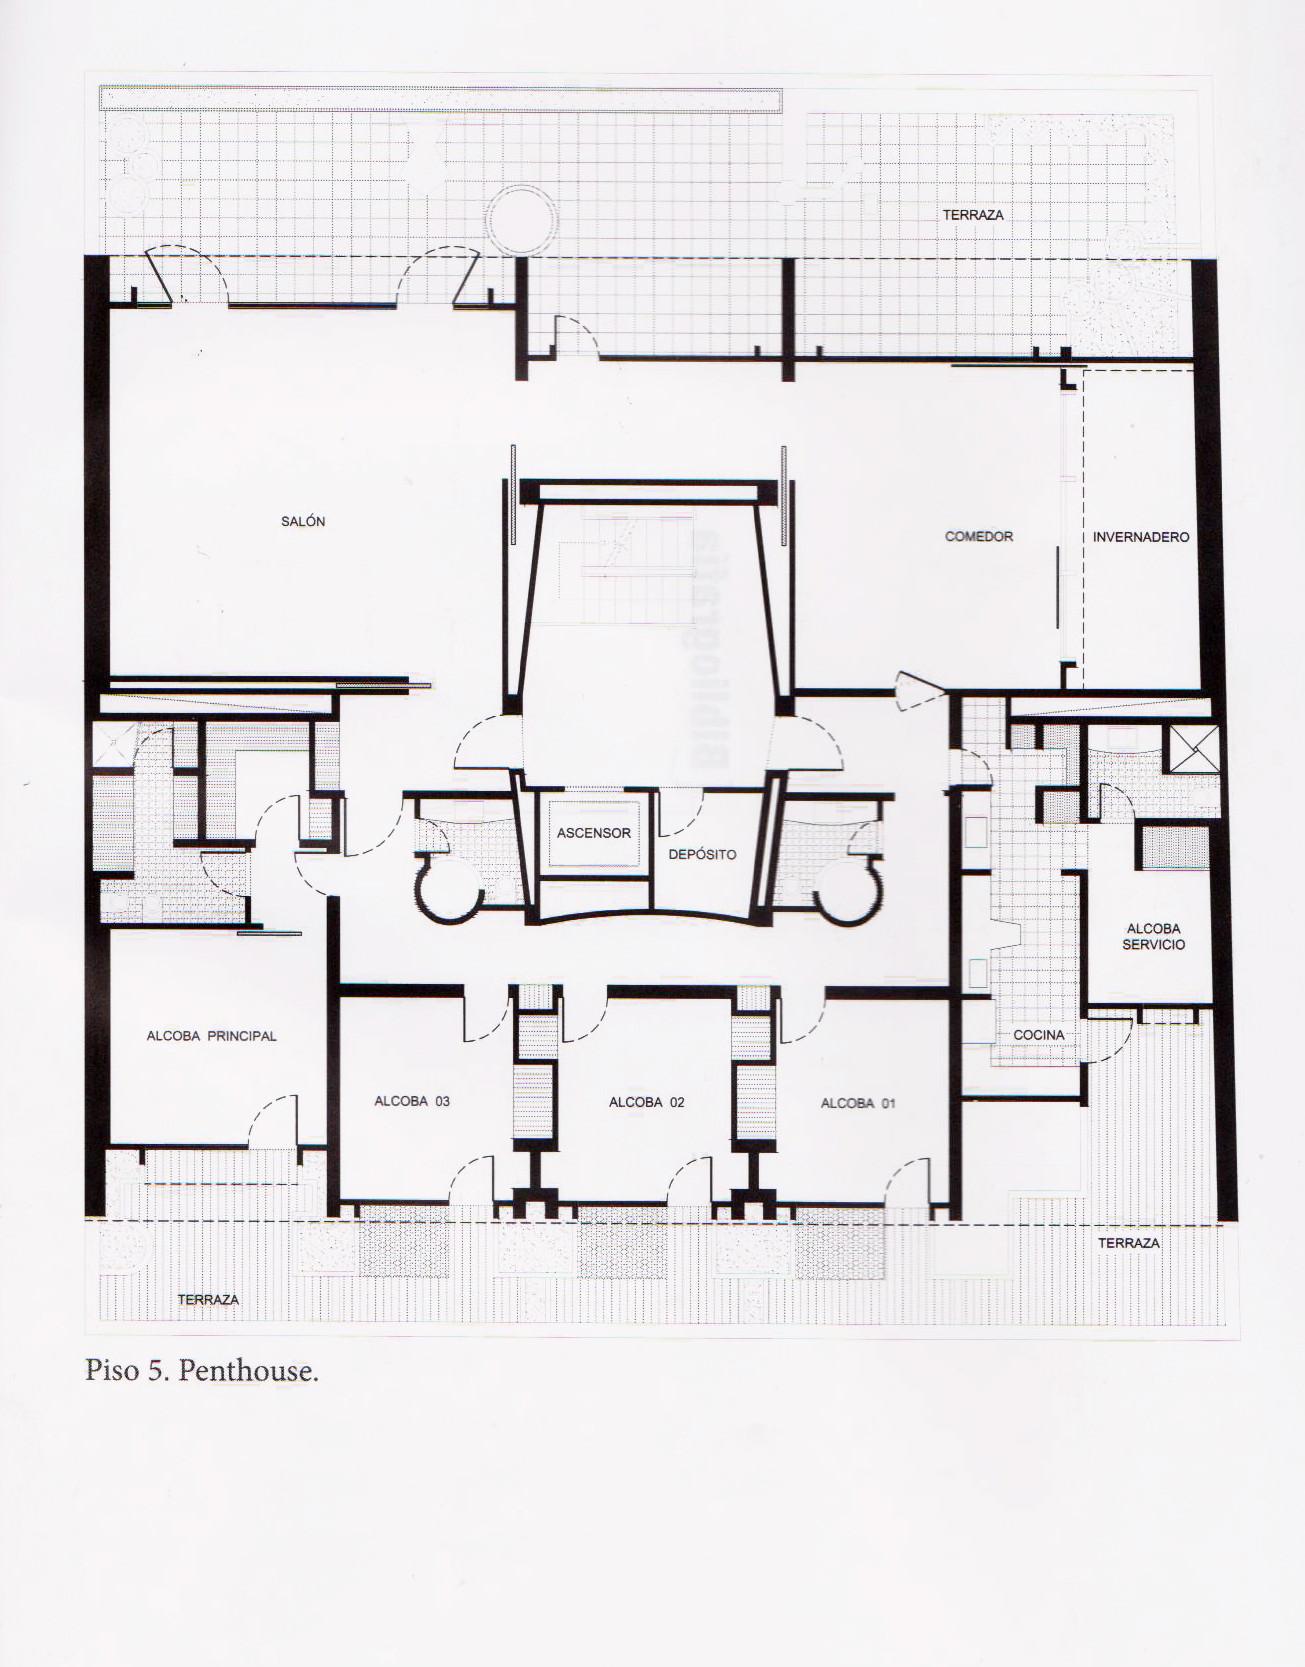 Galer a de ad classics cl sicos de arquitectura edificio for Plantas de oficinas arquitectura